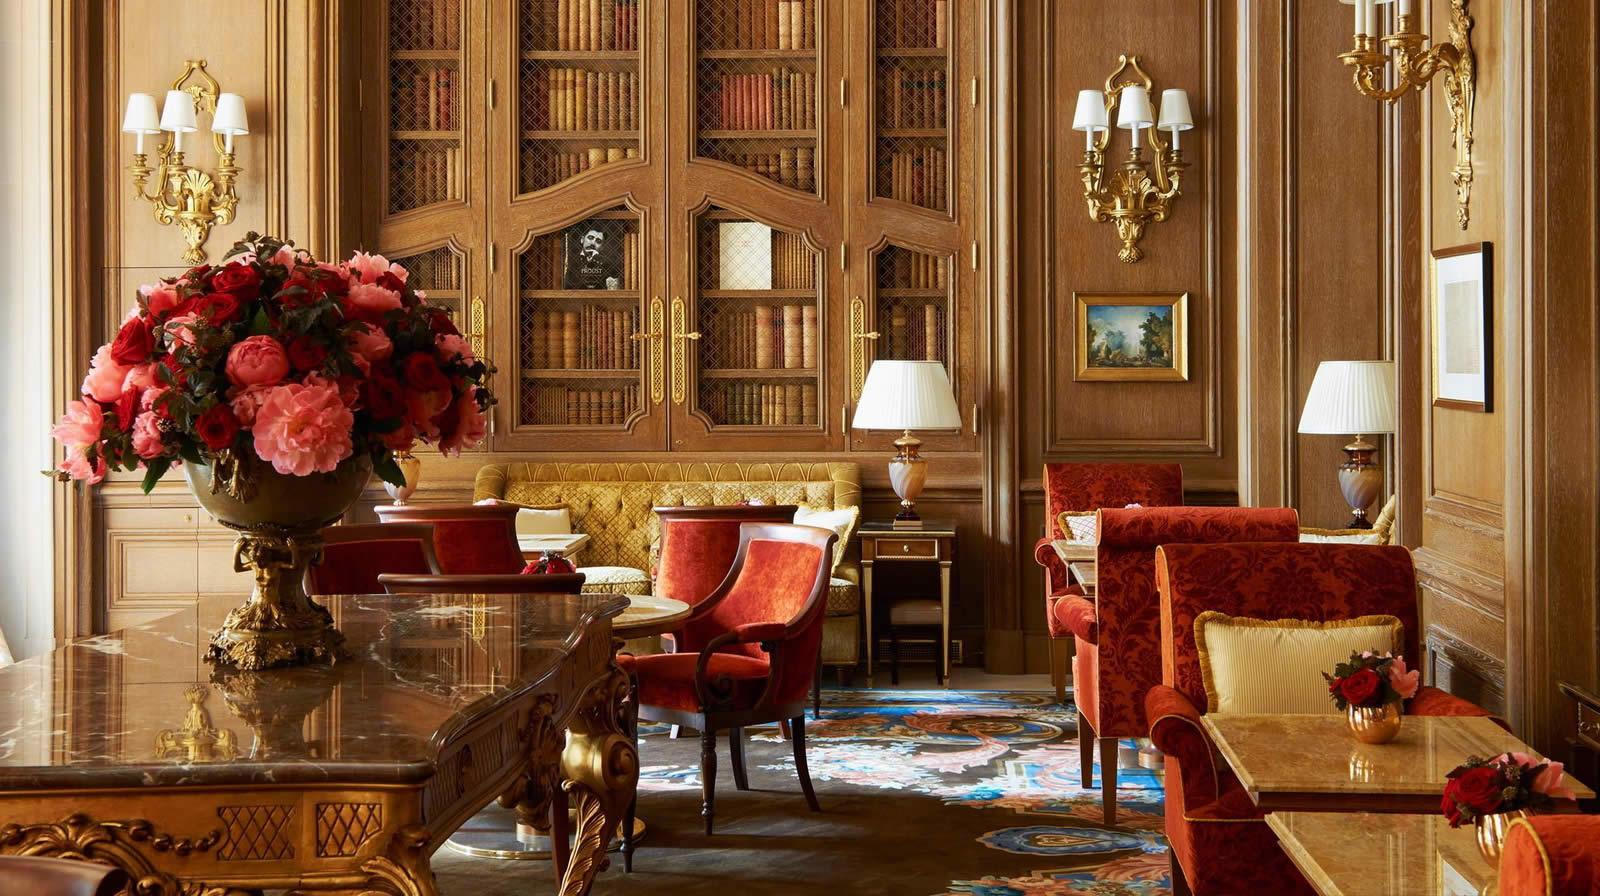 ritz-paris-hotel-salon-proust-afternoon-tea